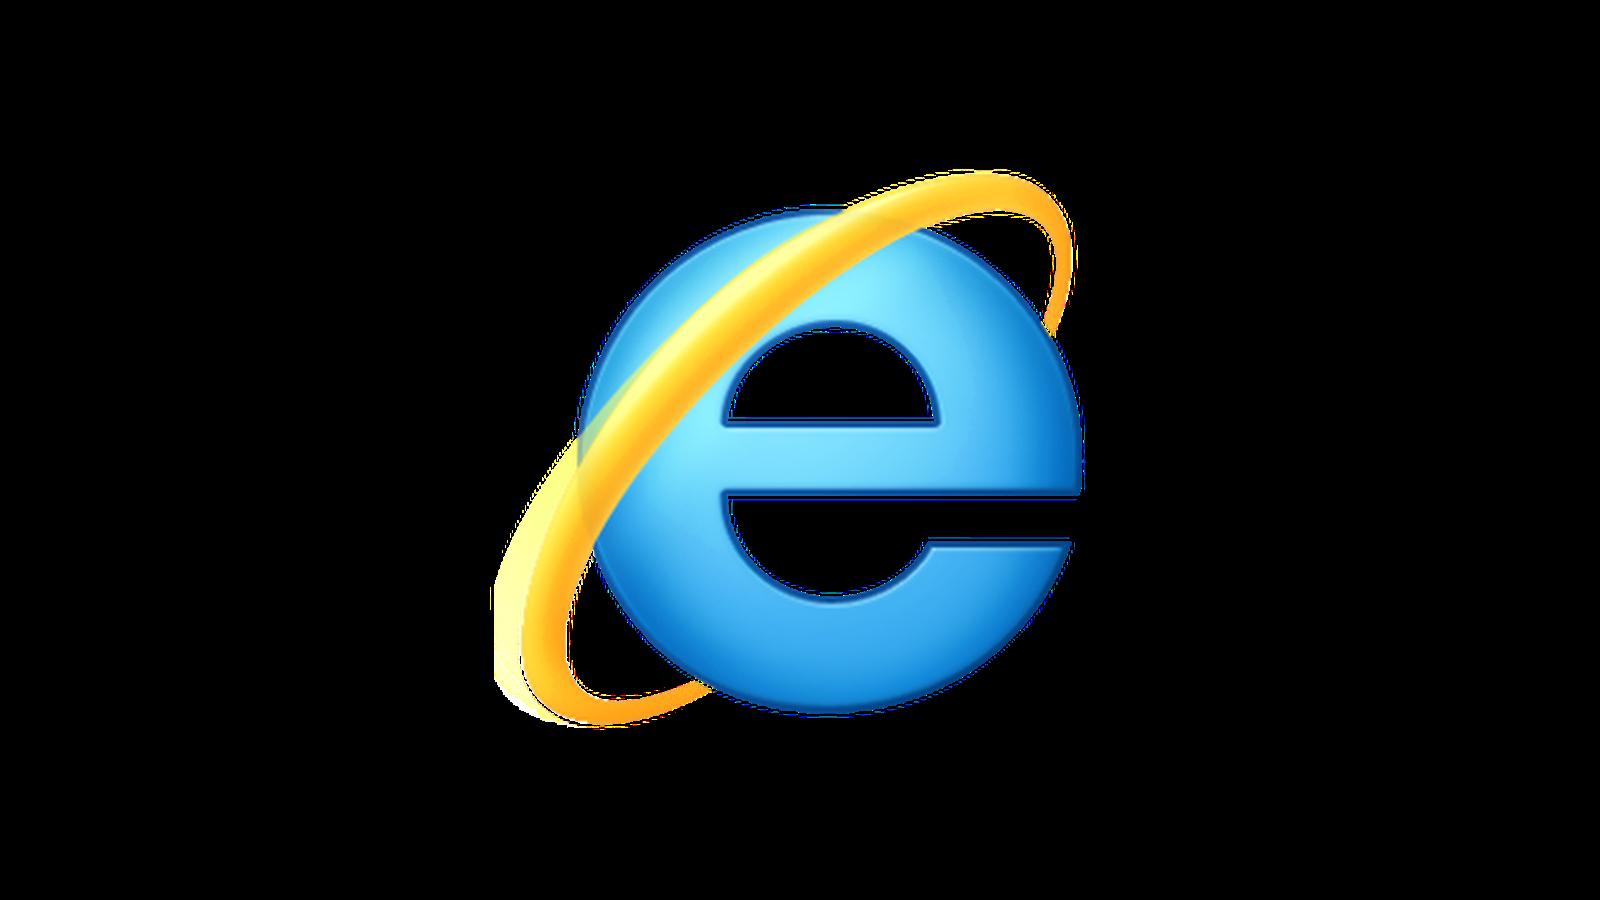 Internet Explorer tweets offer to help Obama with broken ...